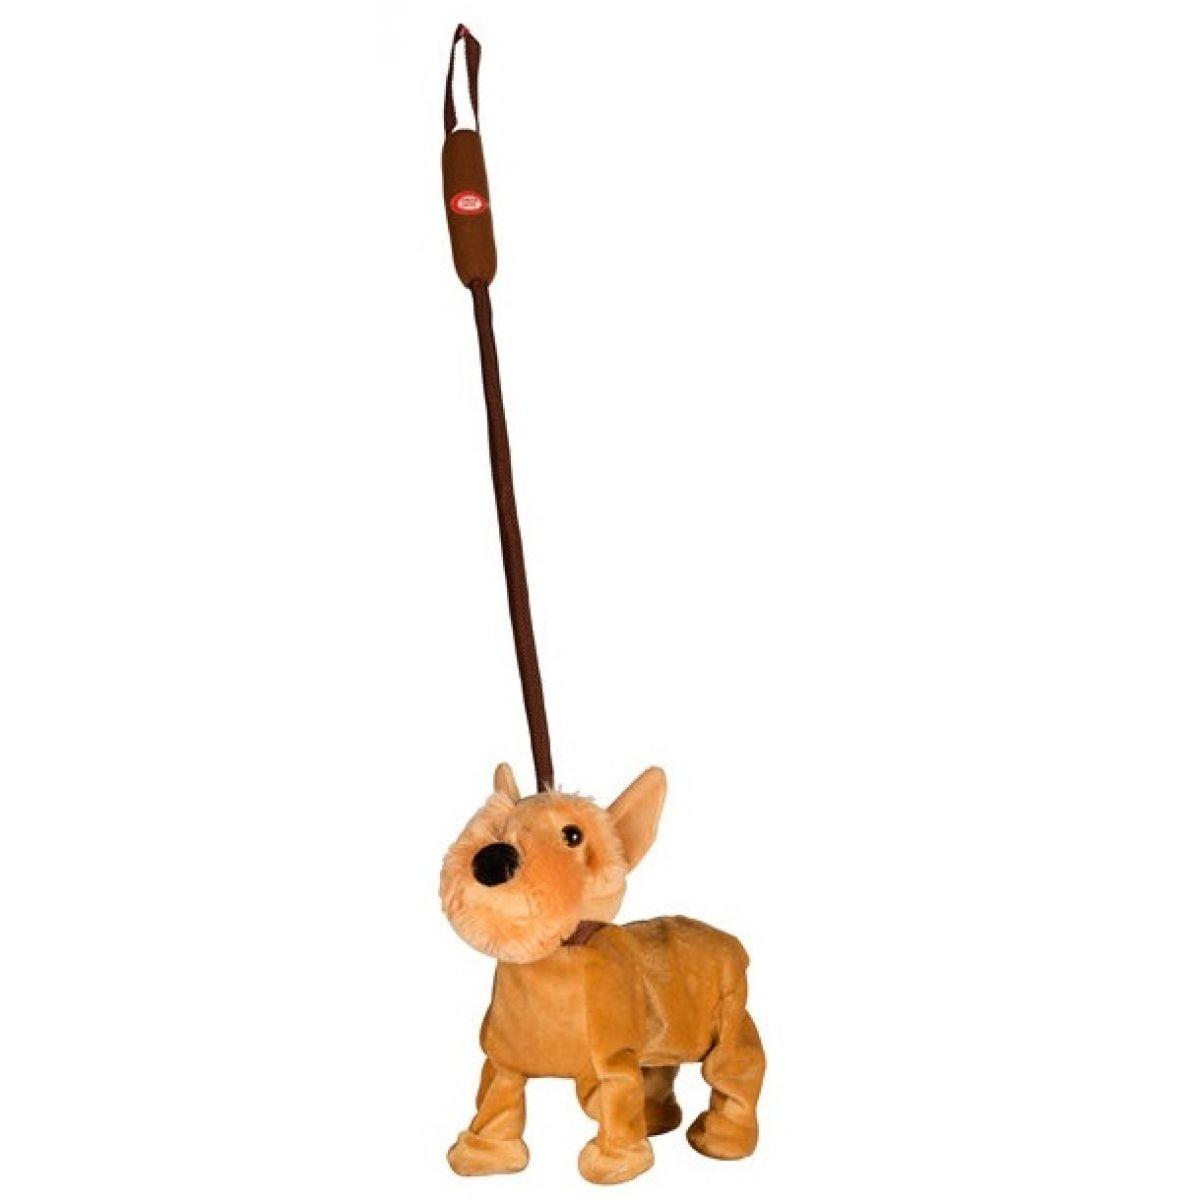 Pes na tyčce 25 cm - Hnědý foxteriér